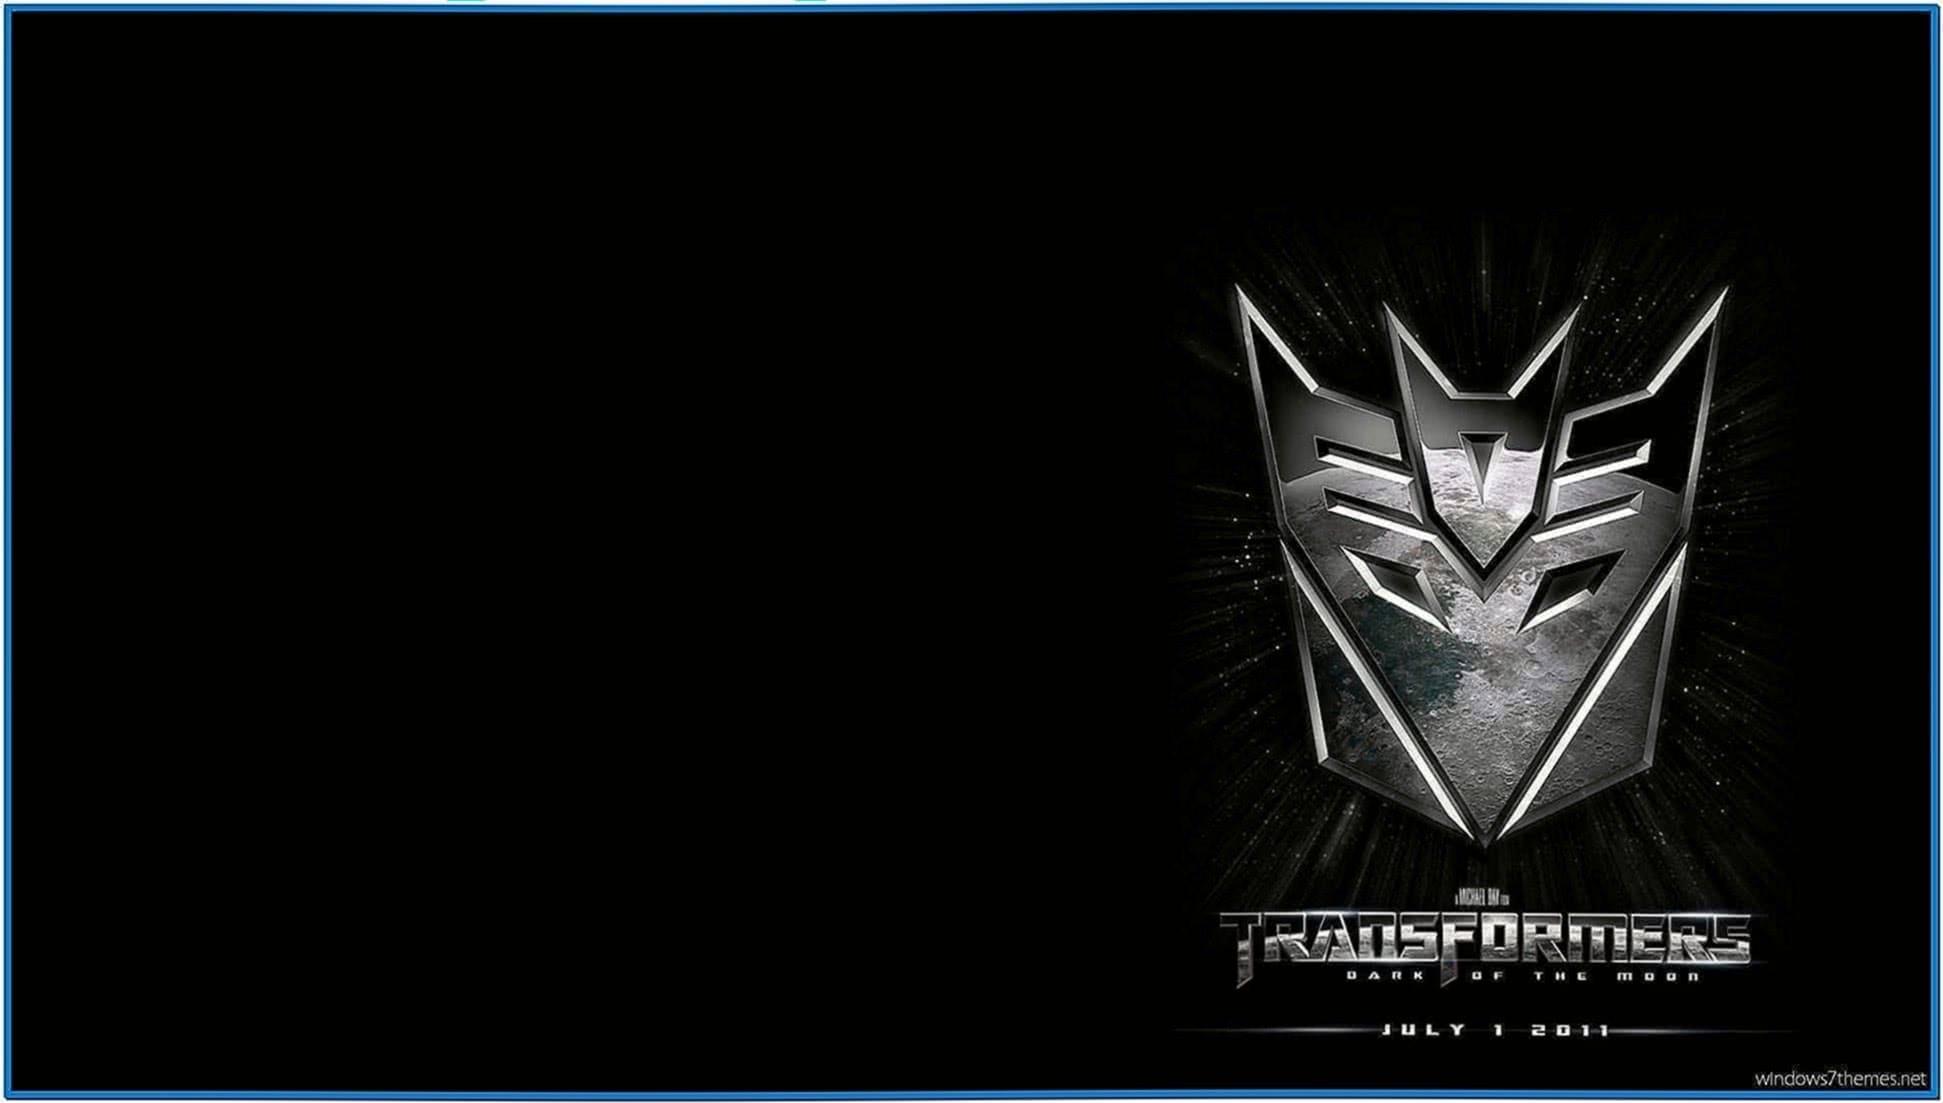 Transformers Movie Screensaver Windows 7